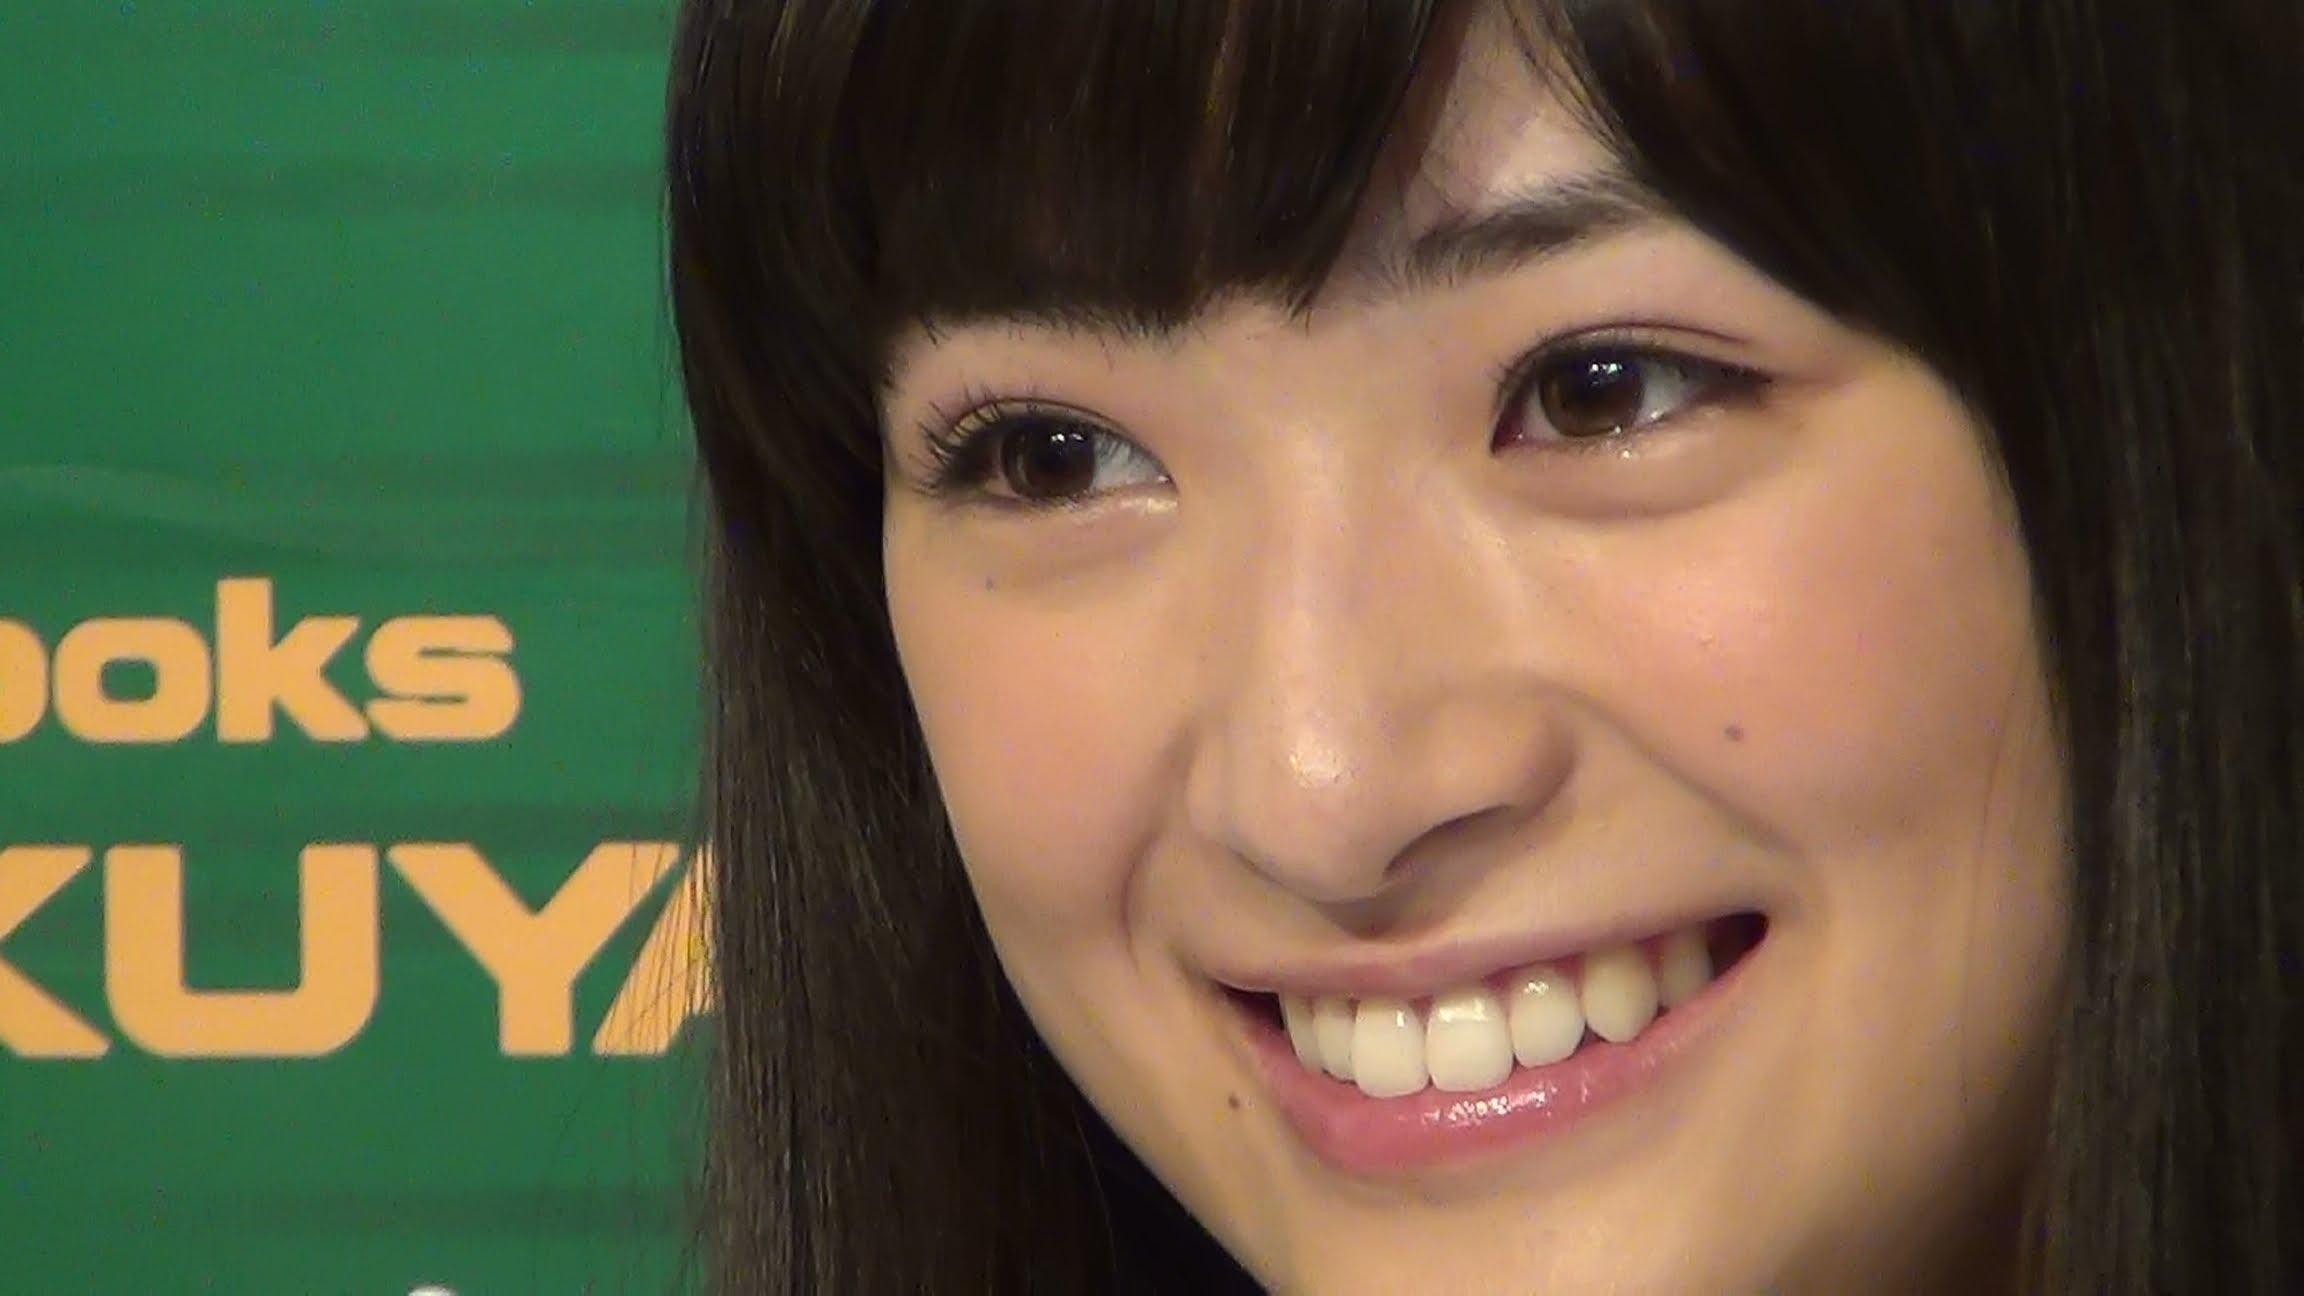 優希美青 現在 激太り 実は 引退